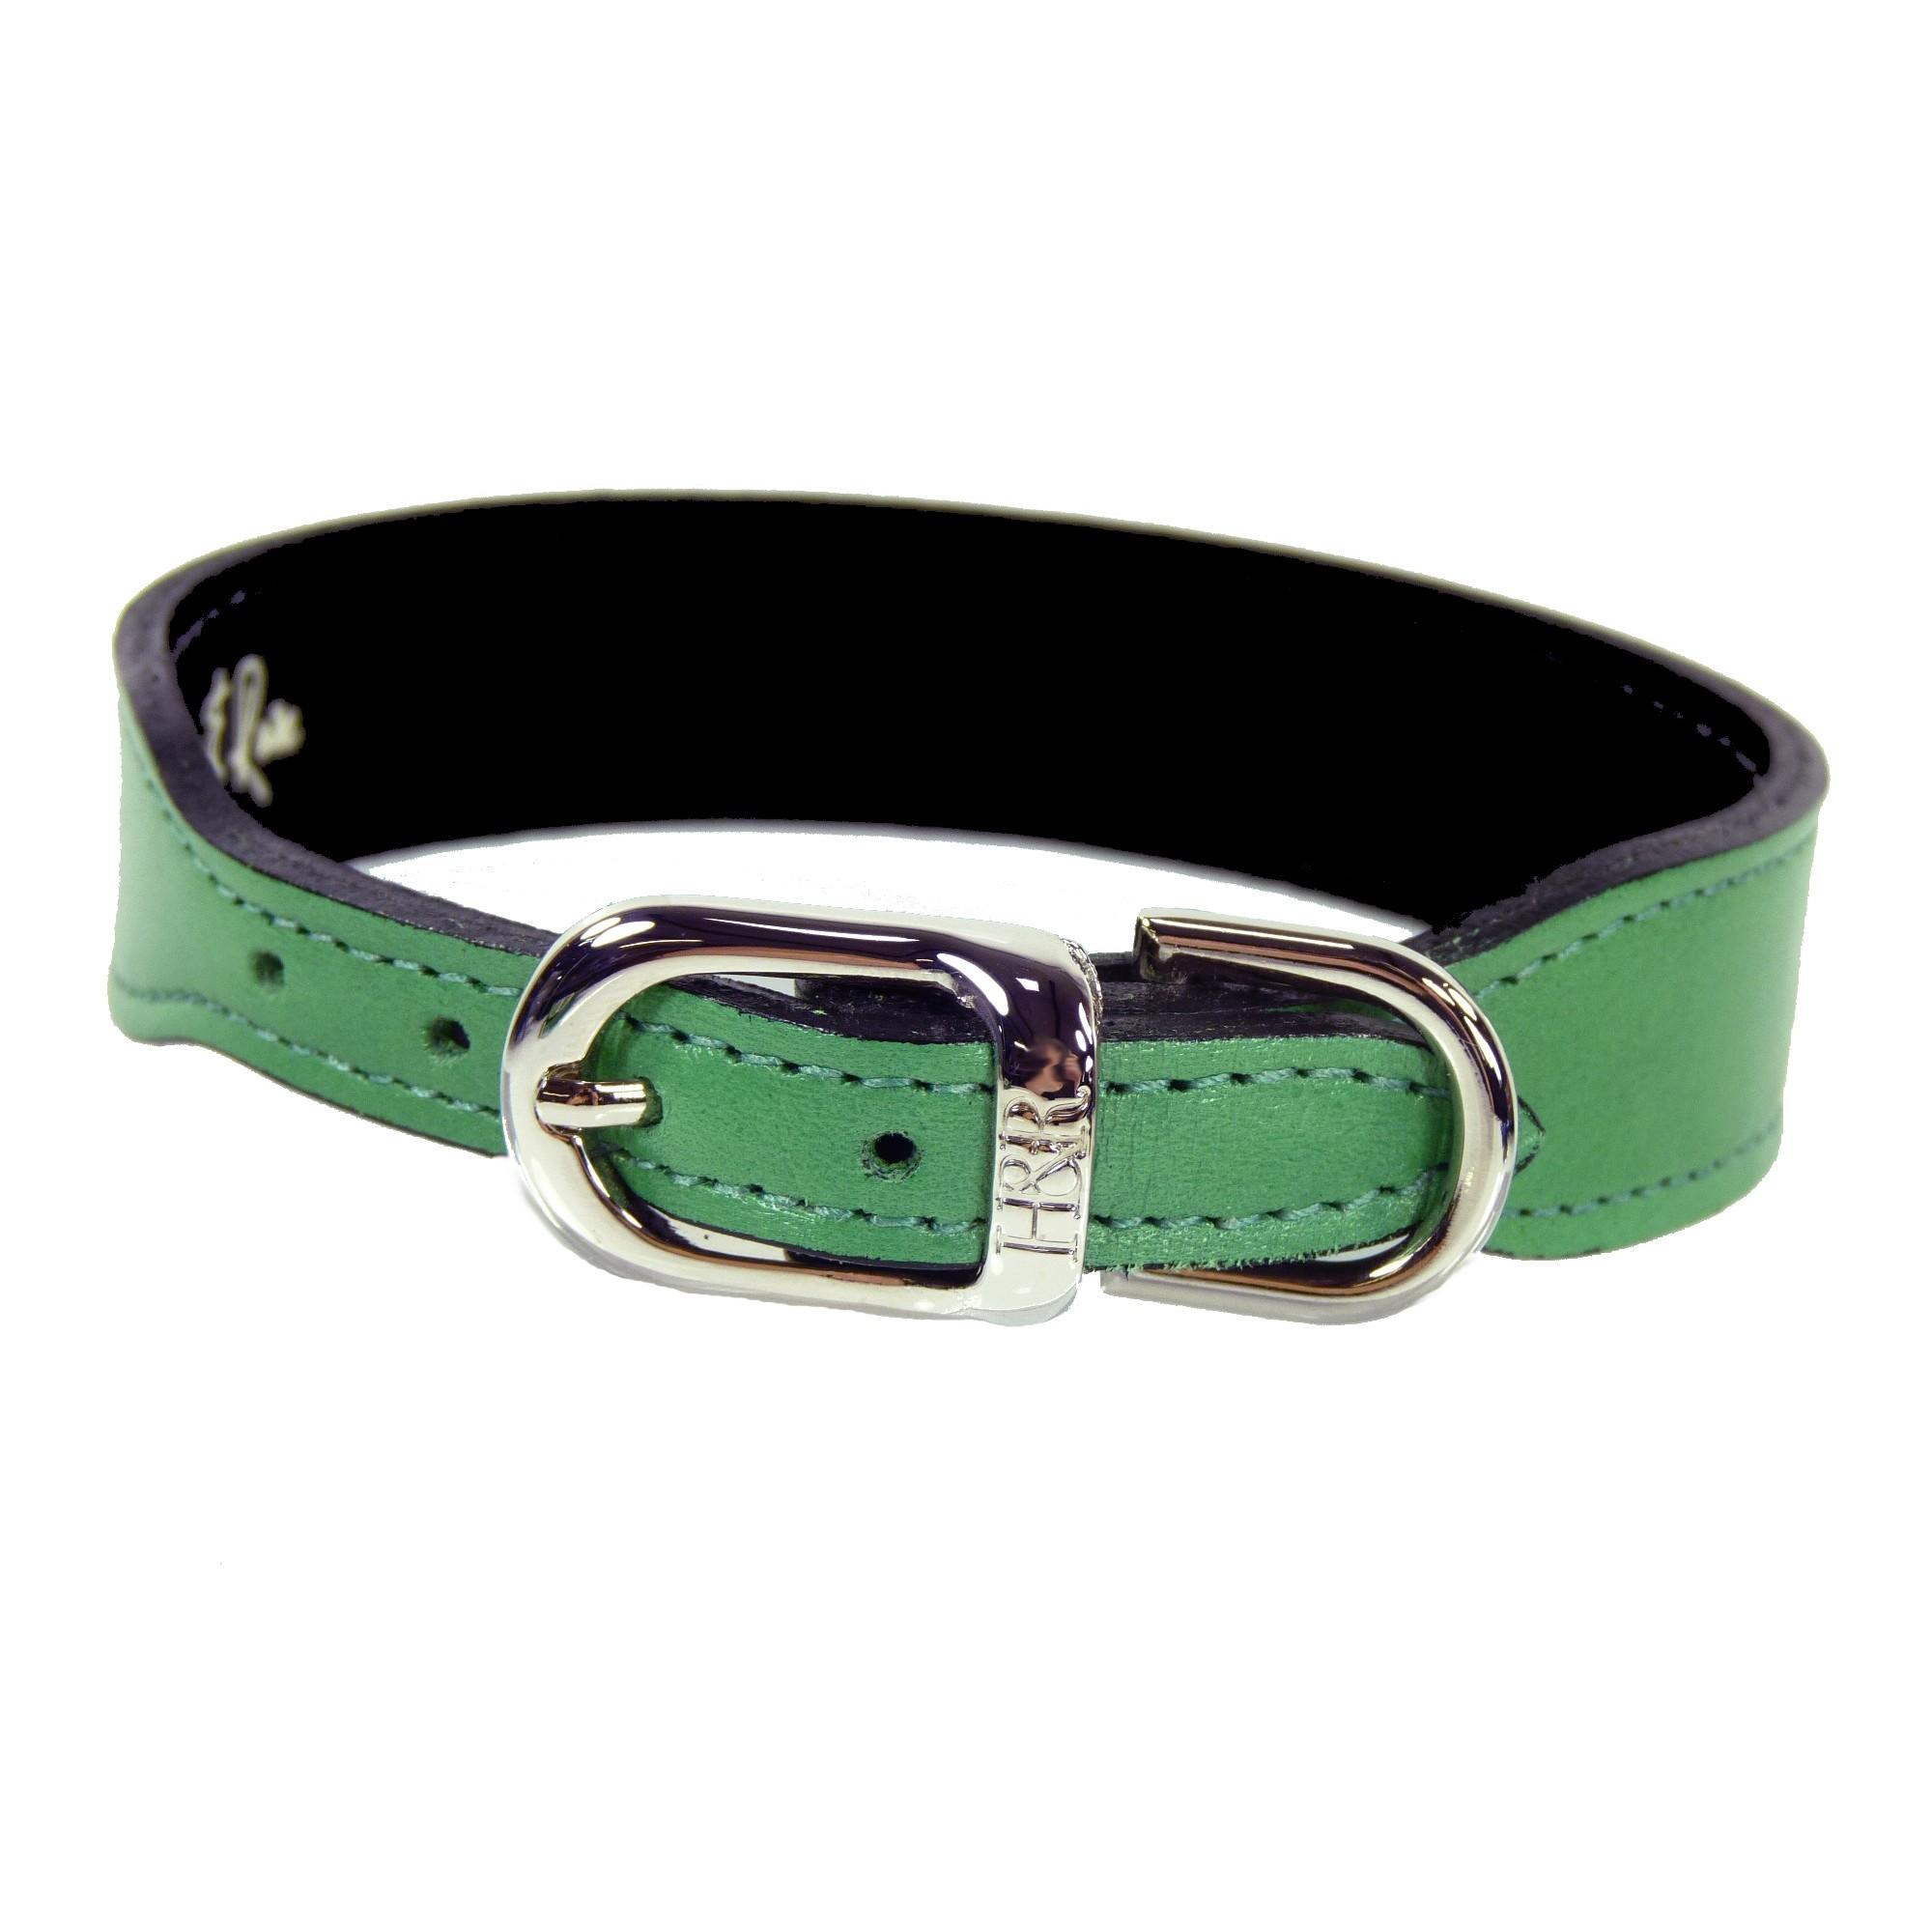 Kelly Green Dog Collar